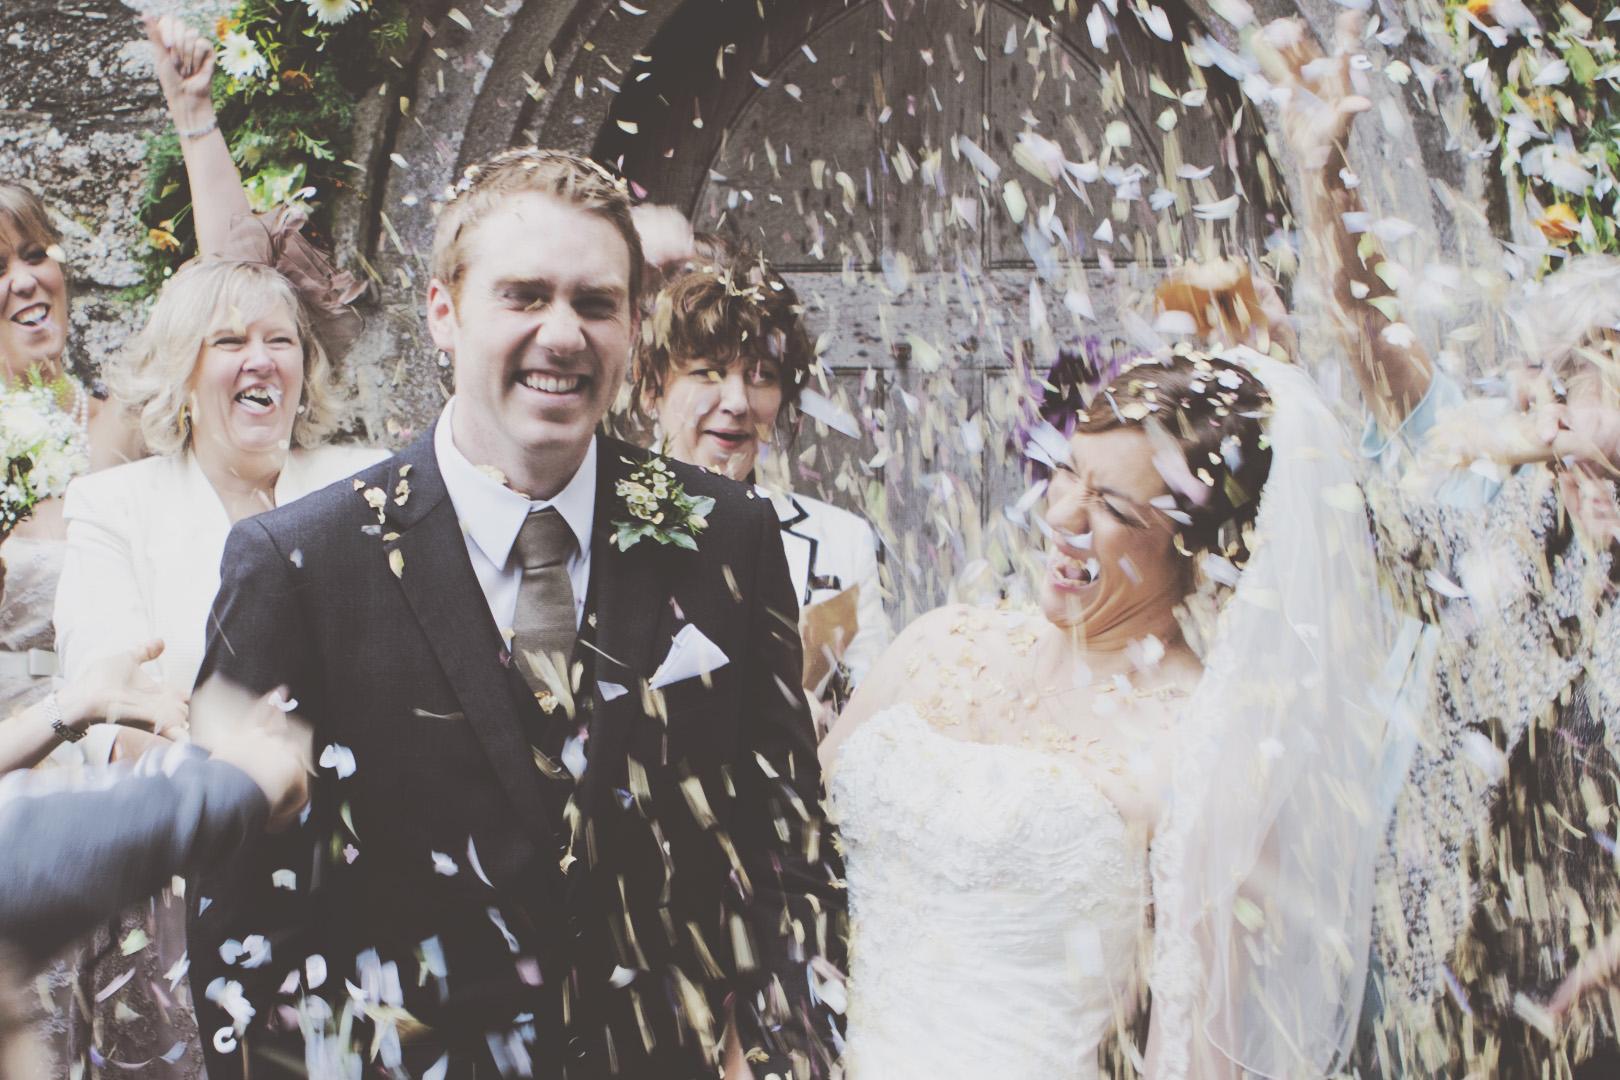 wedding_280913_5294